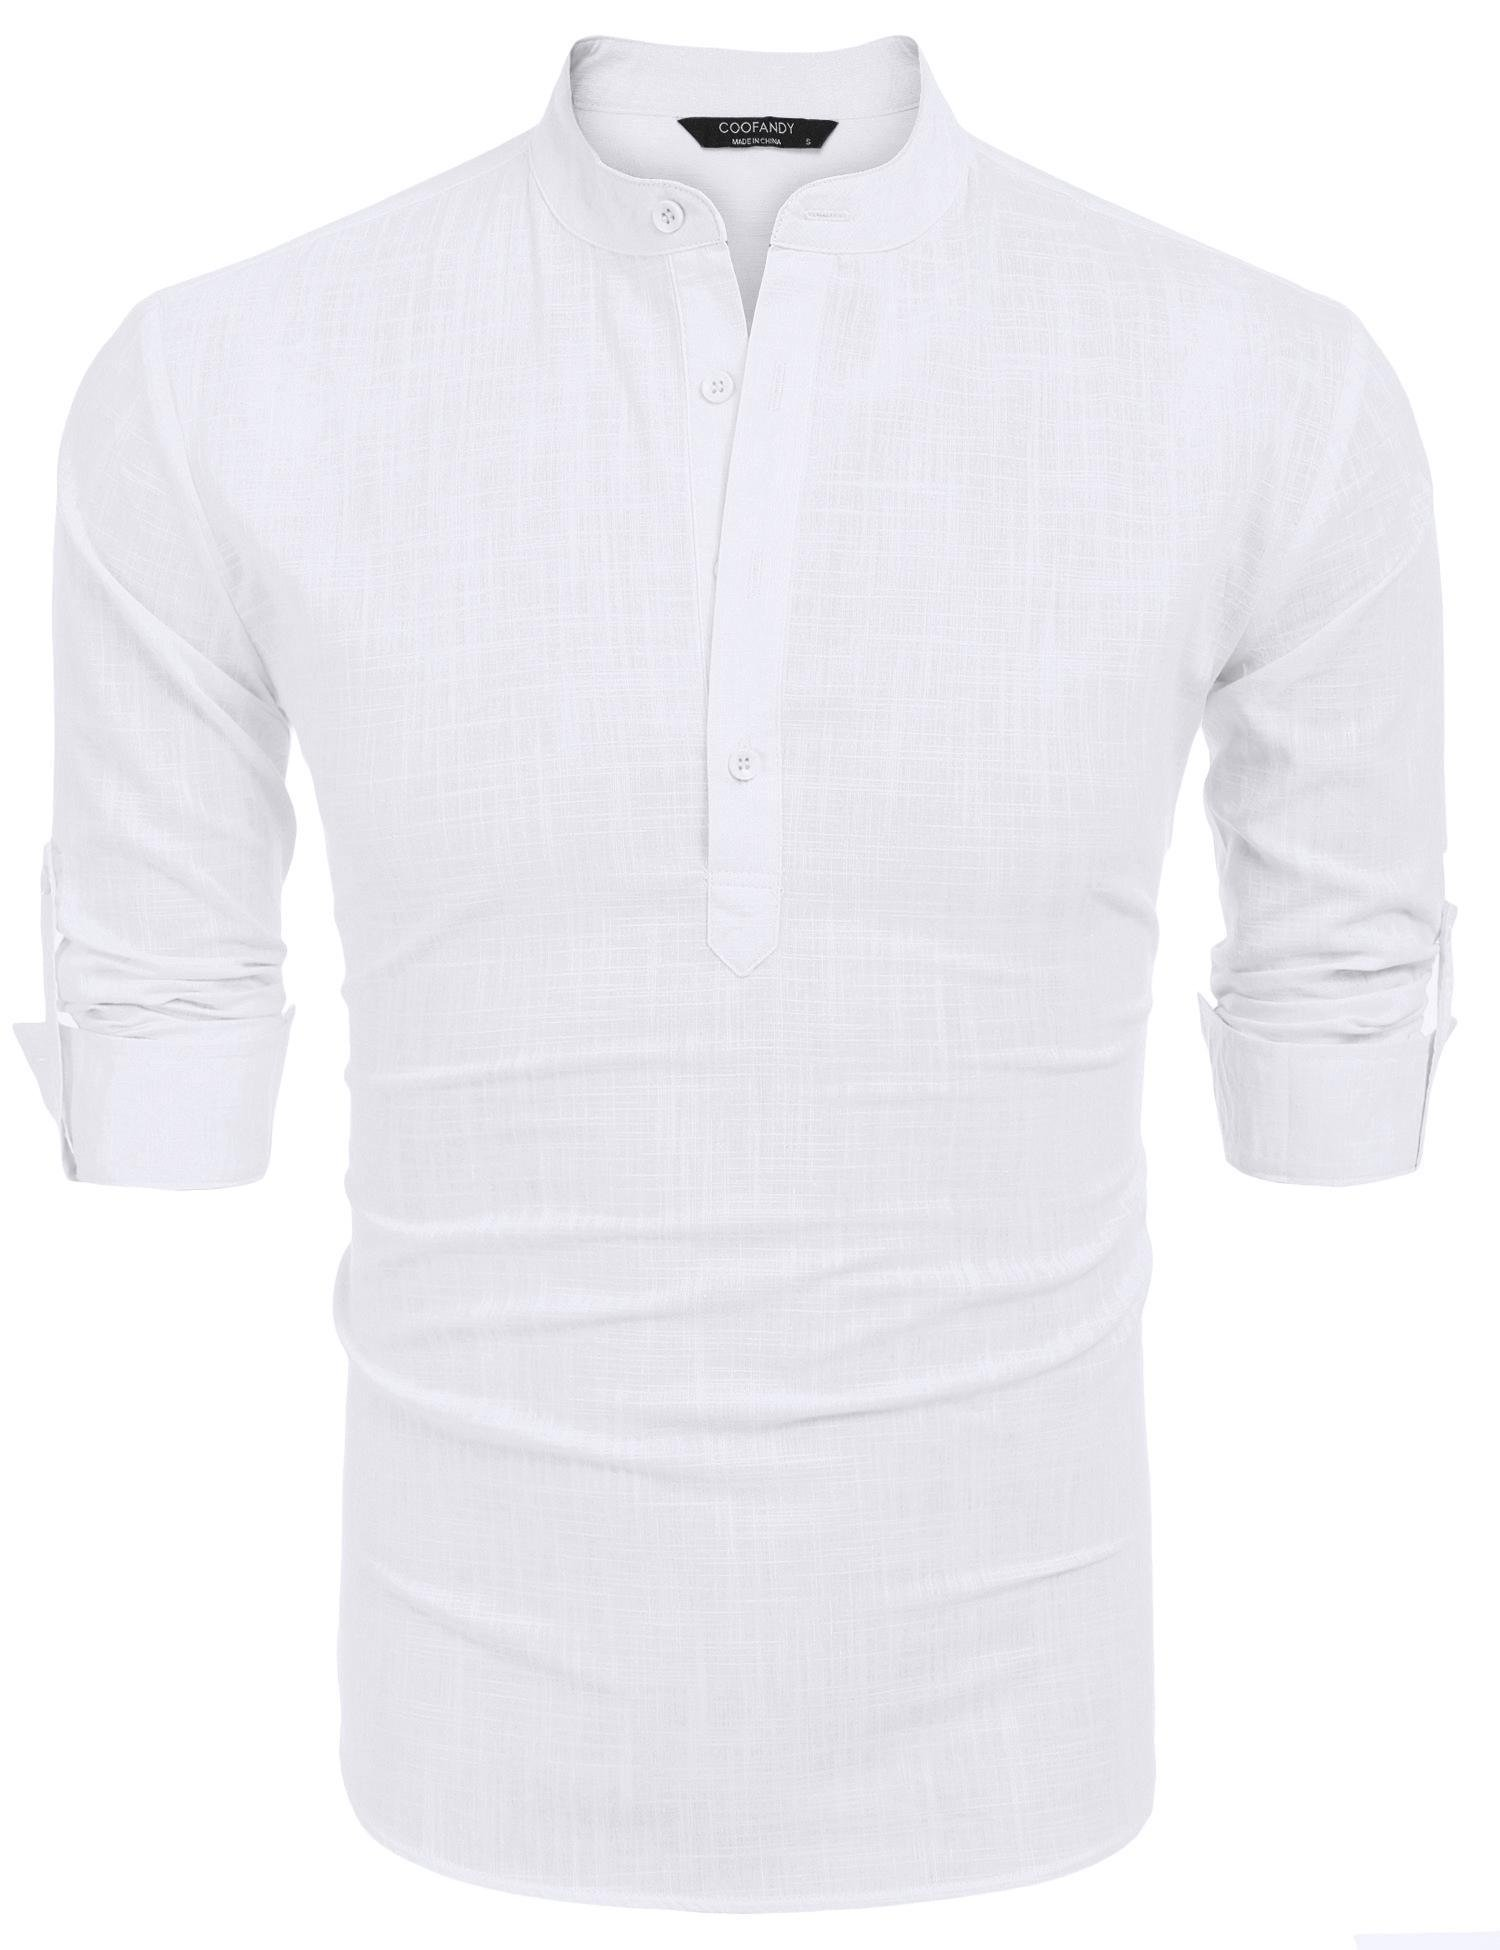 COOFANDY Men Premium Henley Neck Linen Shirts Casual Long Sleeve Basic Shirts,White,Large, White, Large